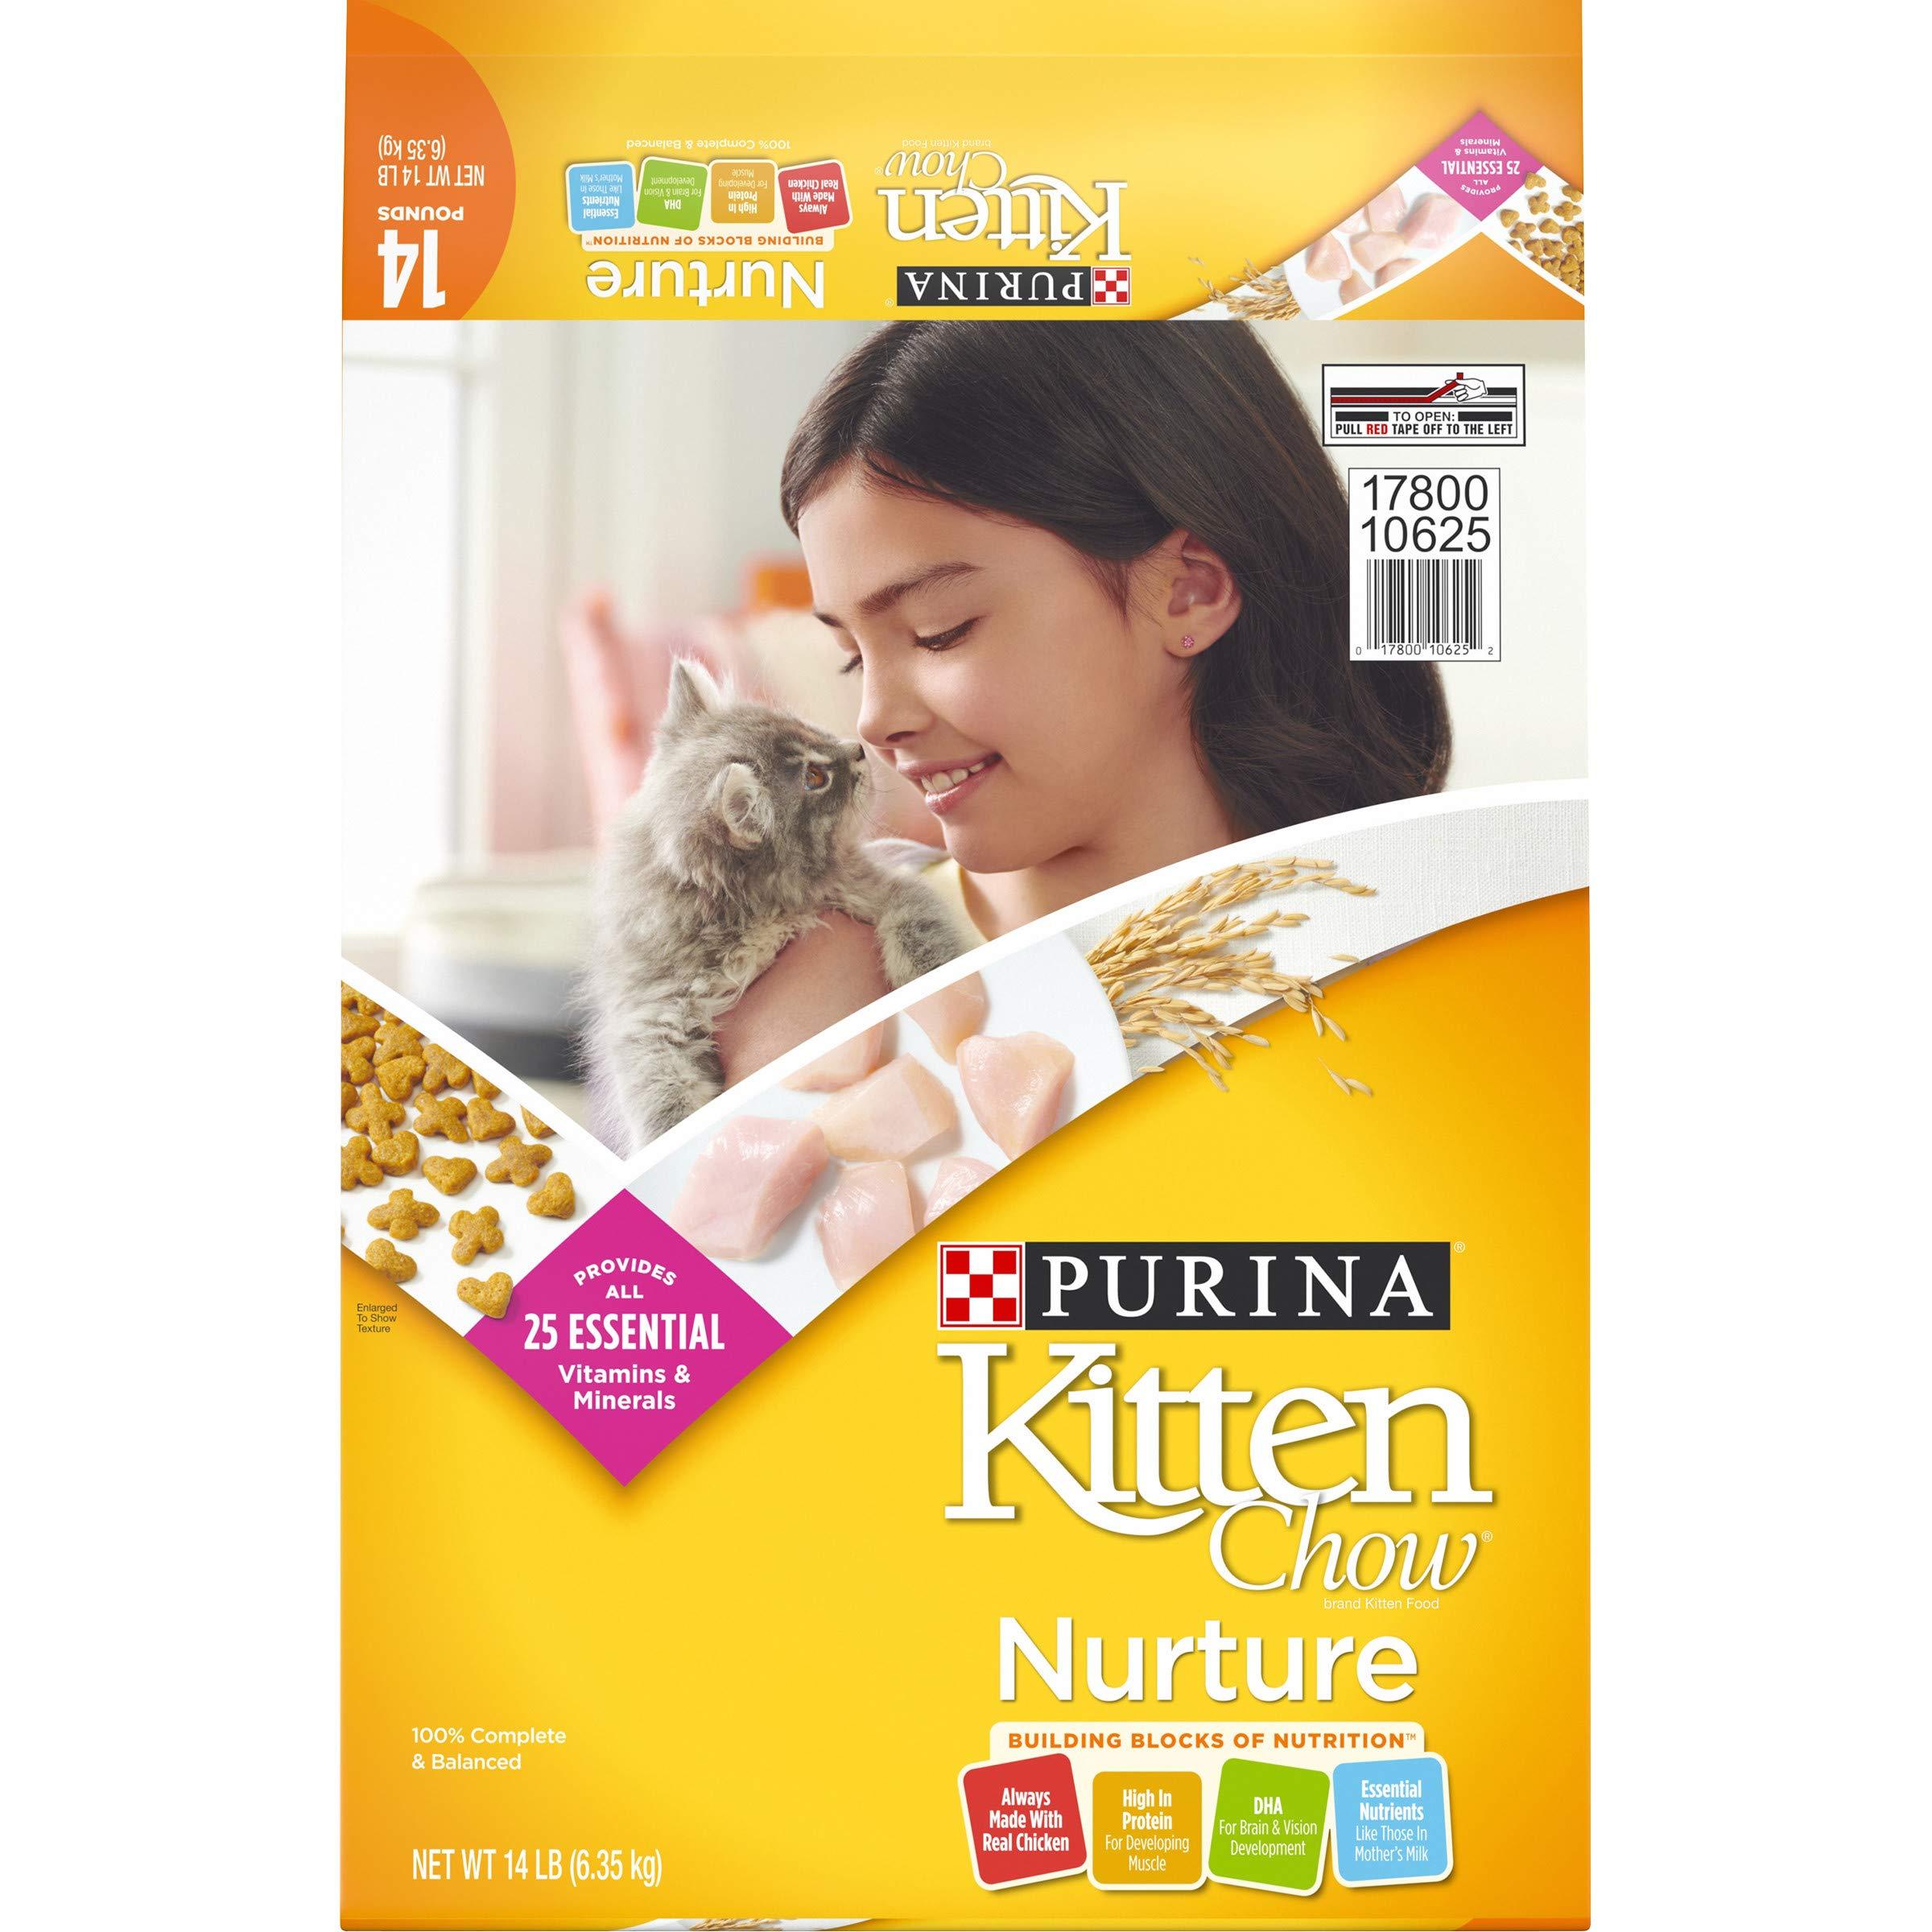 Purina Kitten Chow Dry Kitten Food, Nurture – 14 lb. Bag